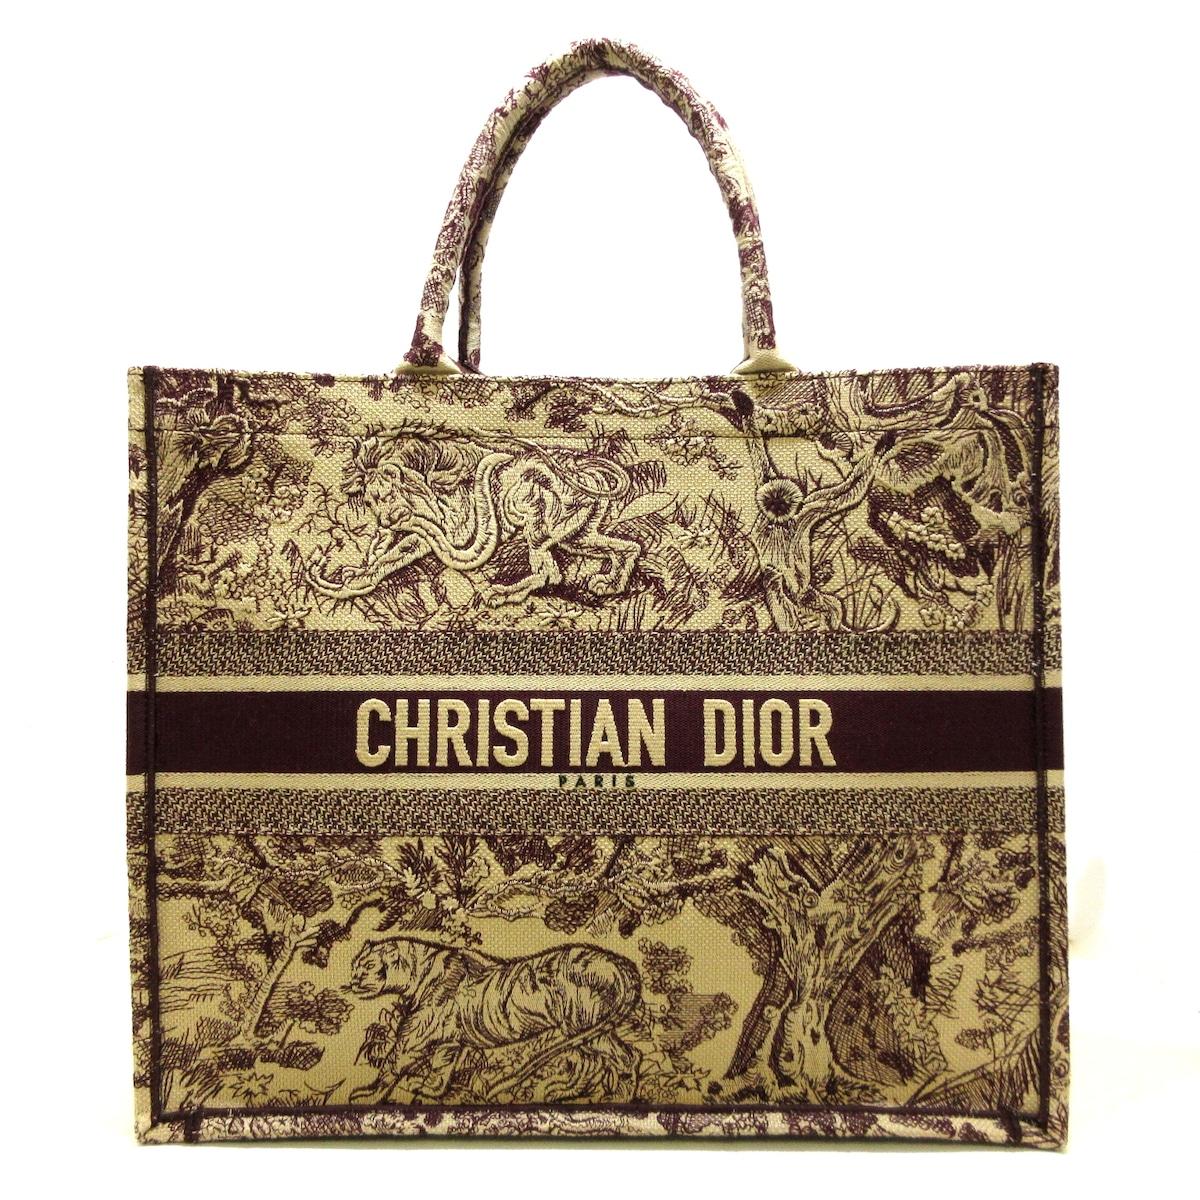 DIOR/ChristianDior(ディオール/クリスチャンディオール)のブックトートラージ/トワル ドゥ ジュイ エンブロイダリー